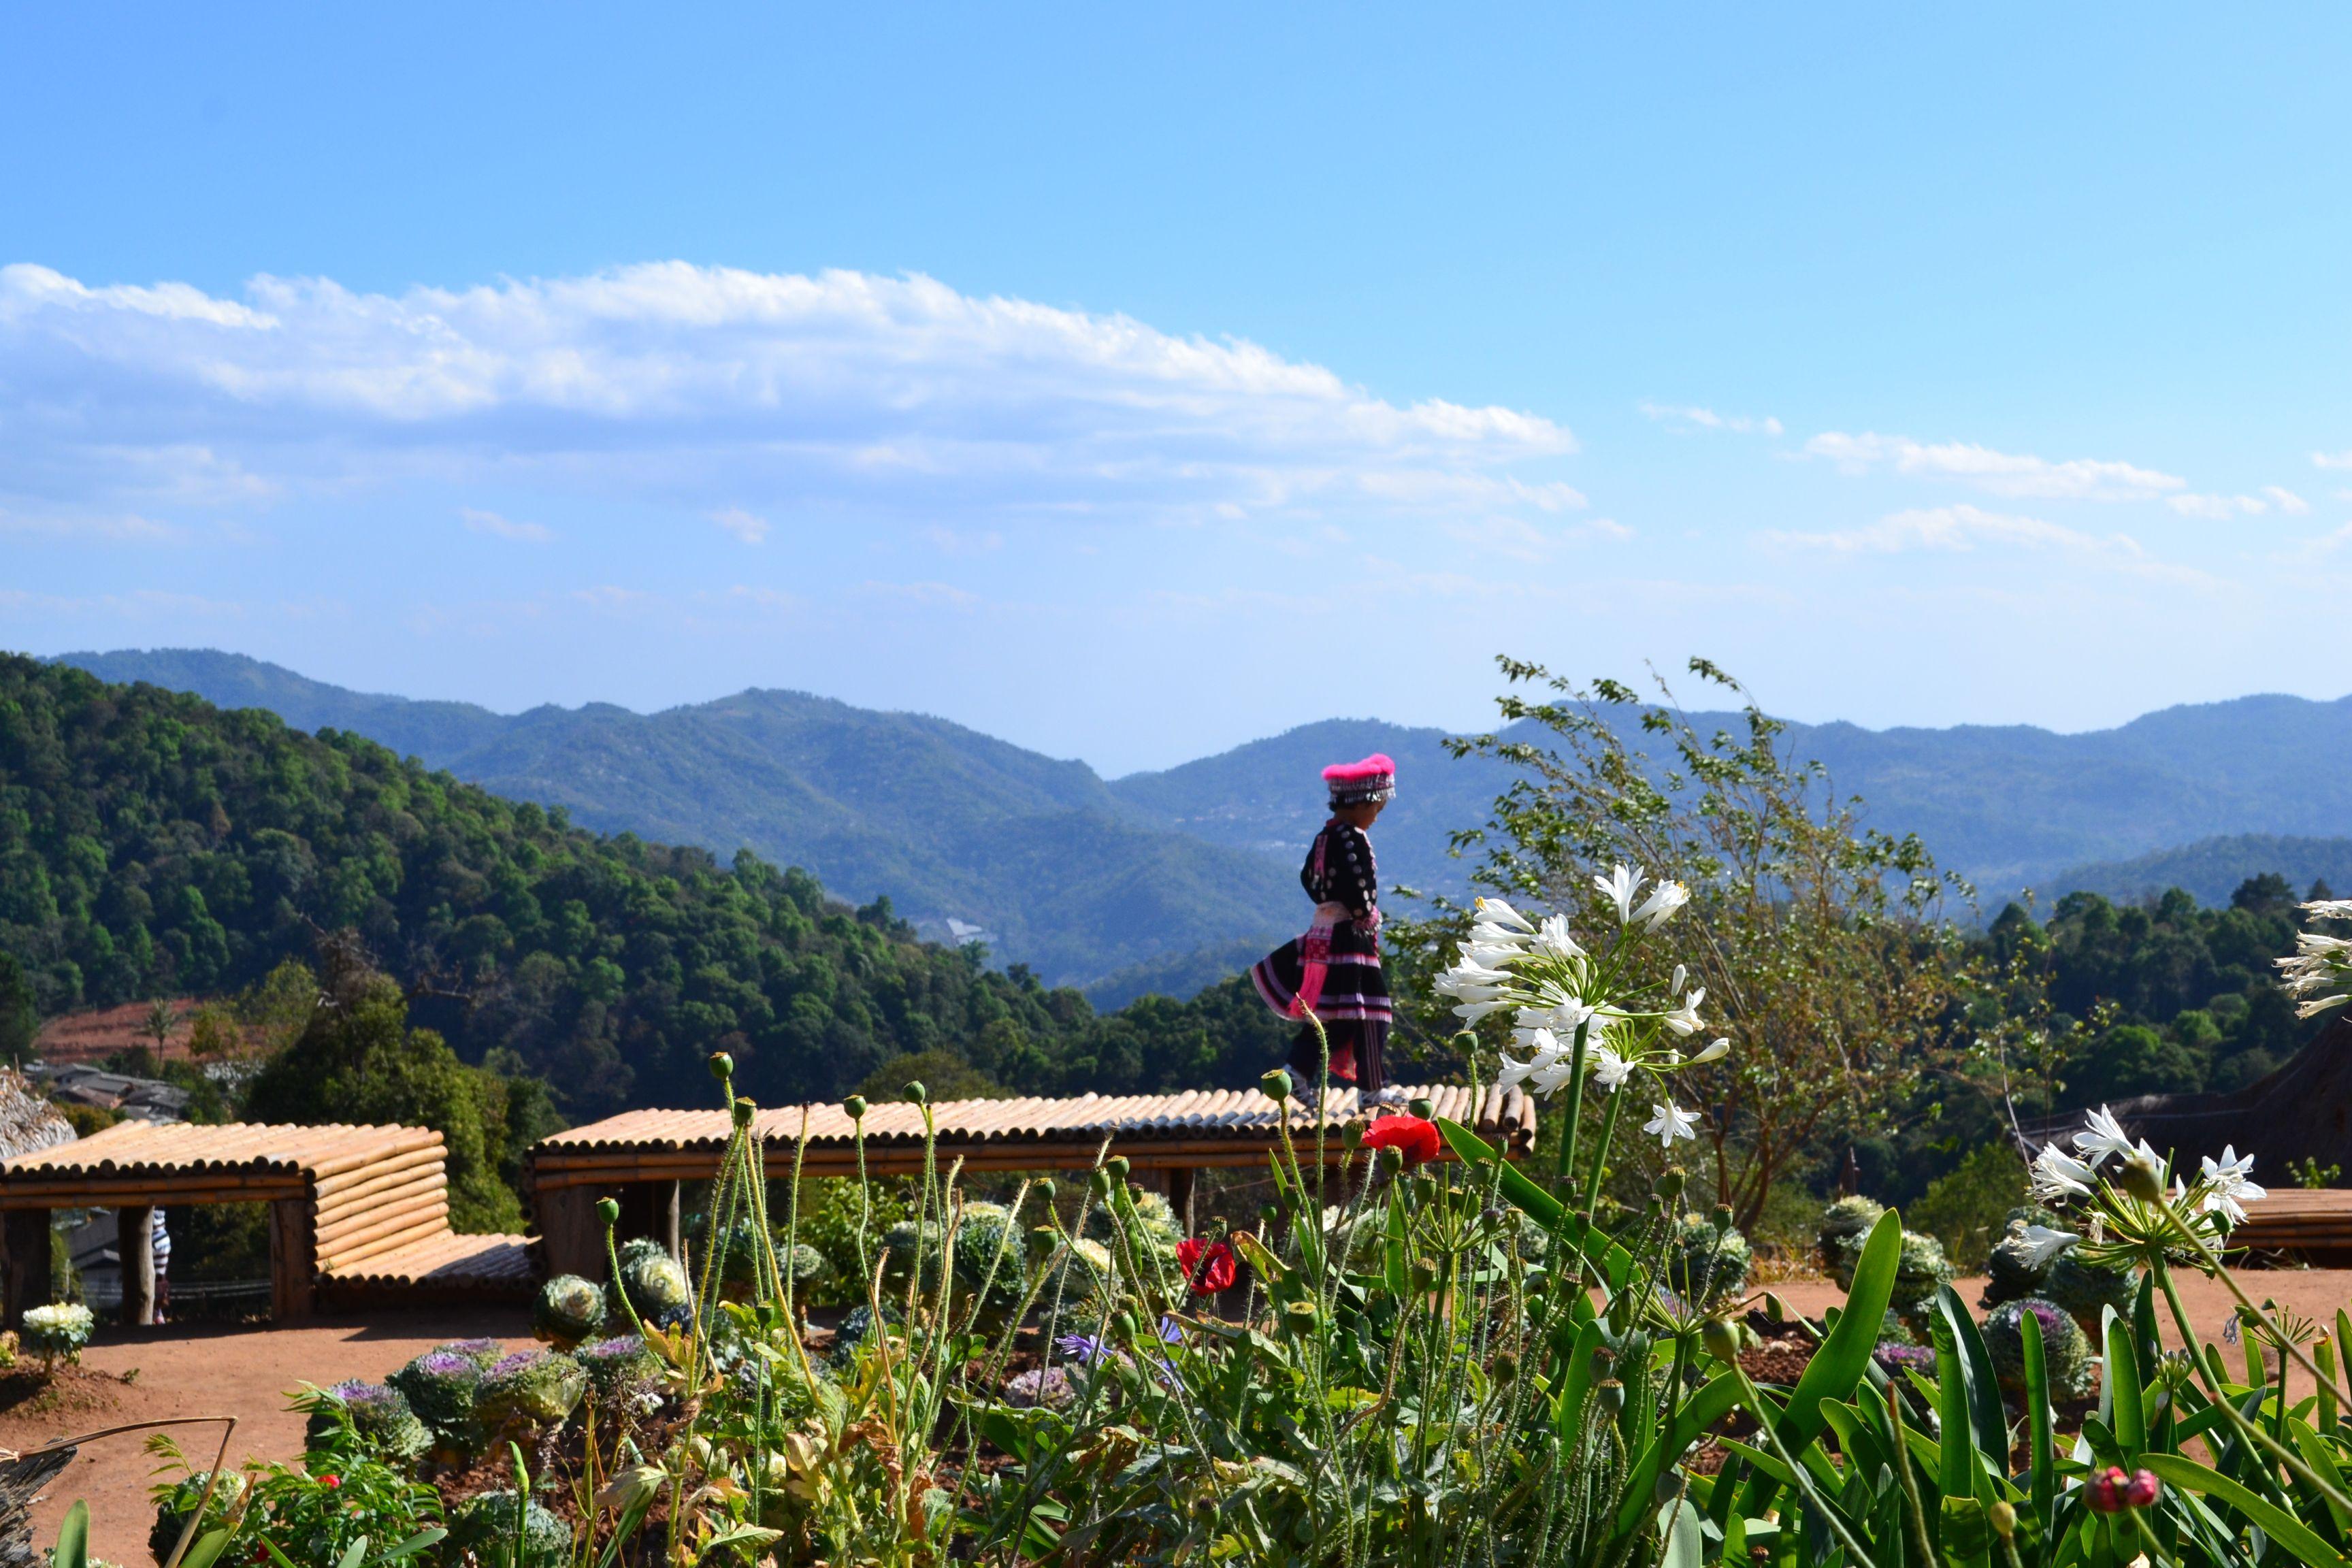 Local #hilltribe #girl enjoying the #view at #monjam near #Chiang #Mai